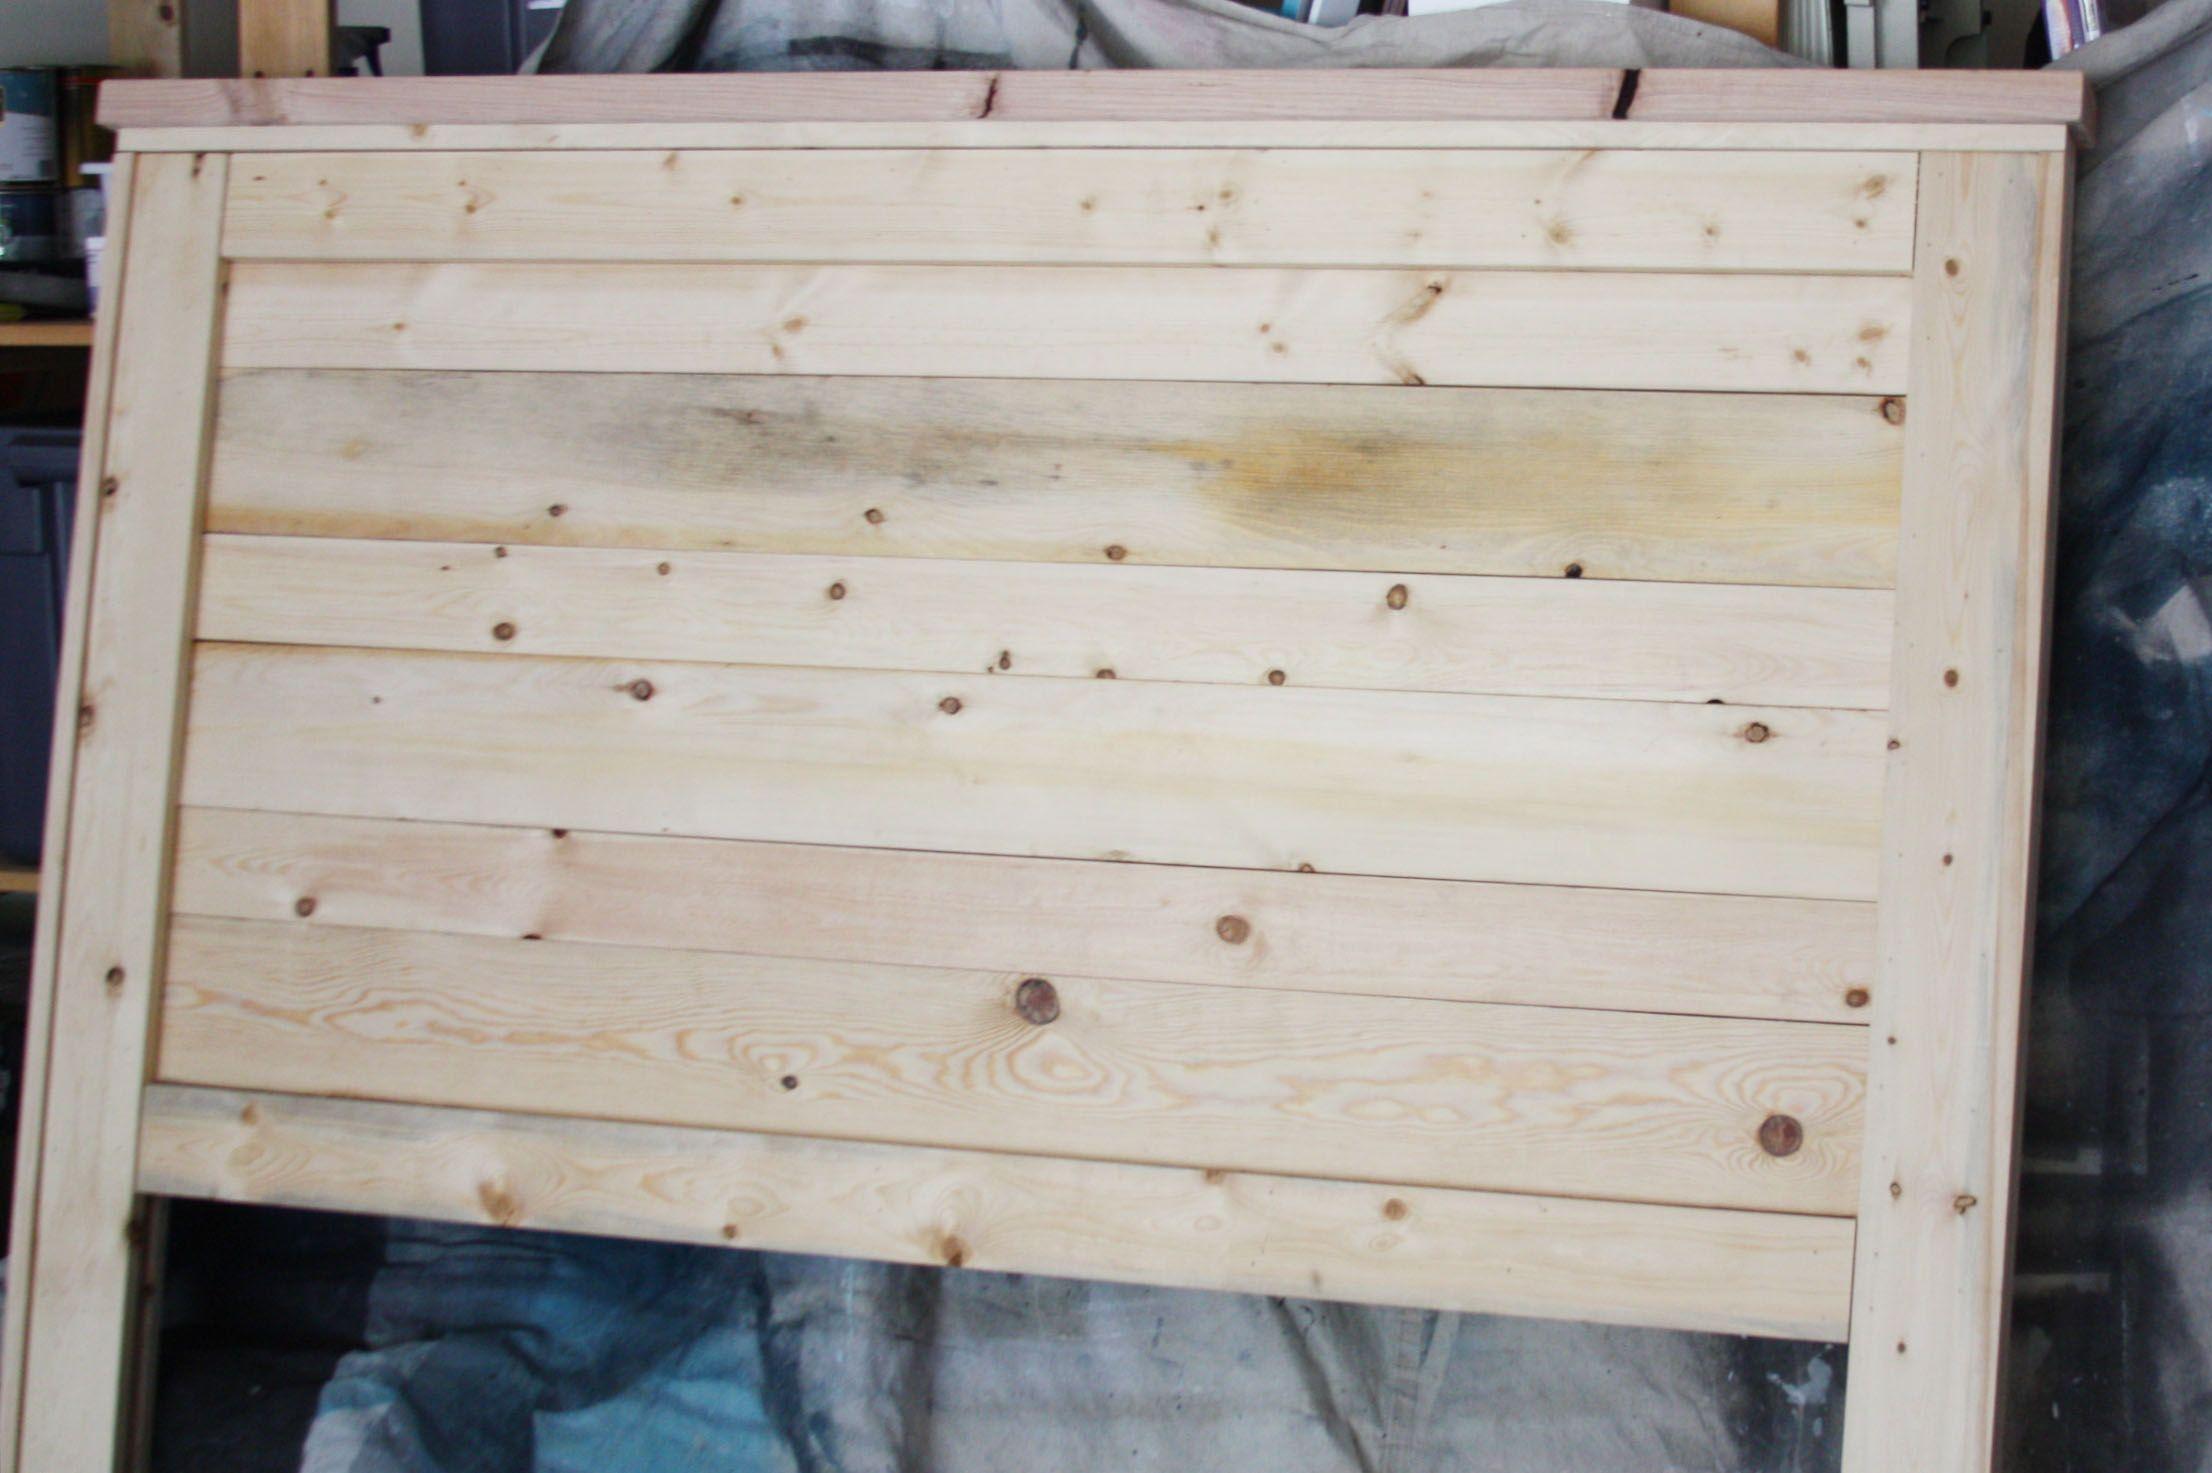 DIY wood headboard | DIY - Home | Pinterest